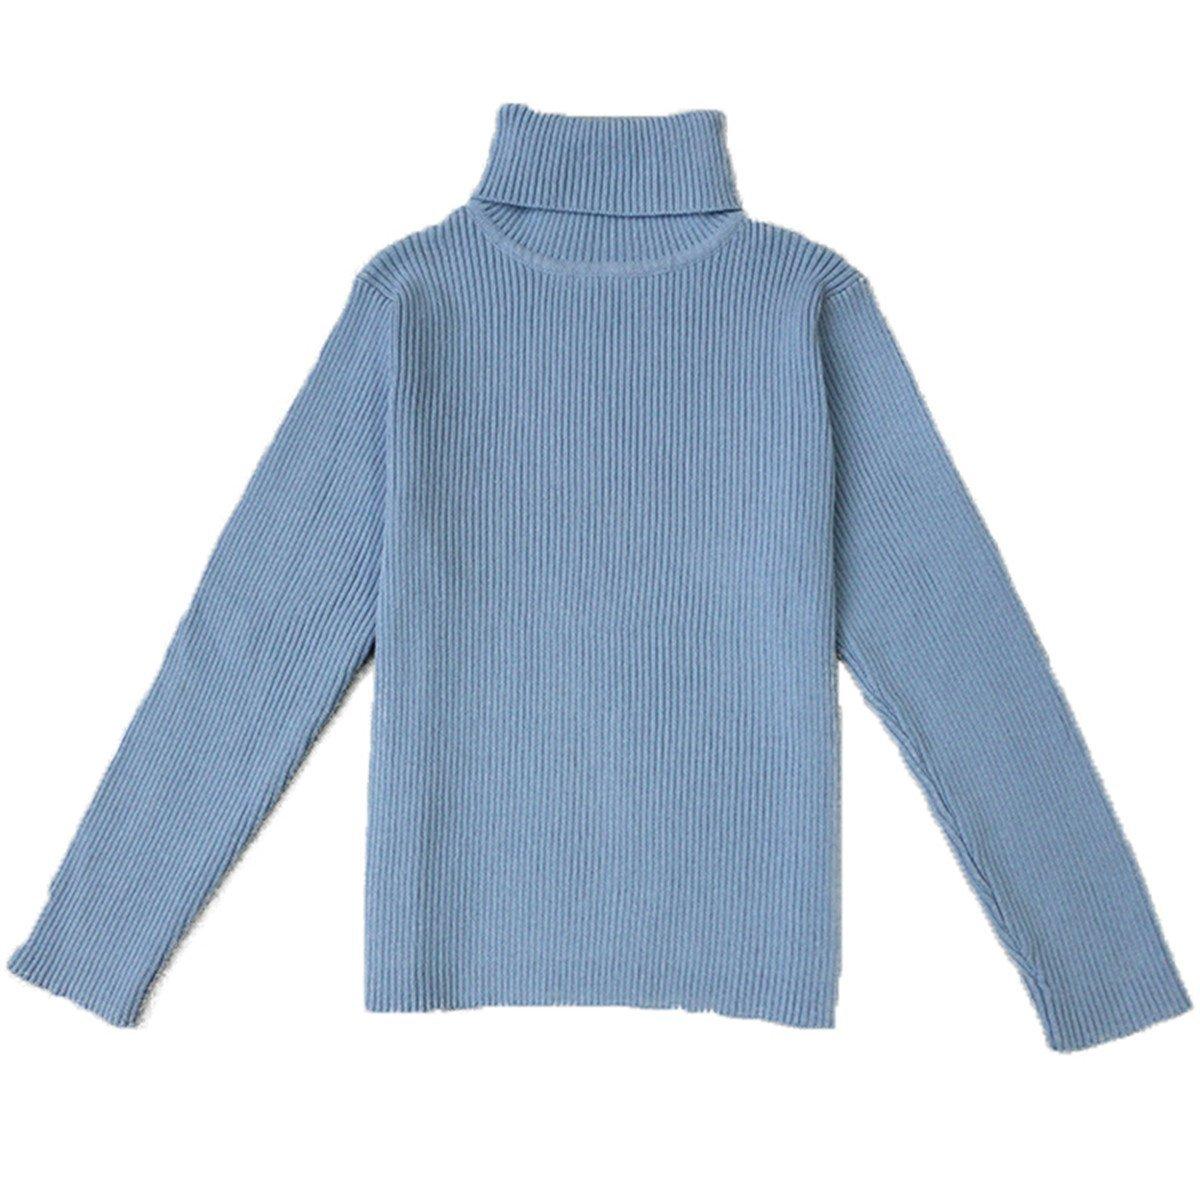 Little Baby Turtleneck Long Sleeve Sweater Basic Solid Fine Knit Warm Sweatshirt Pullover Base Tops (4-5 Years, Blue) by Jojobaby (Image #1)